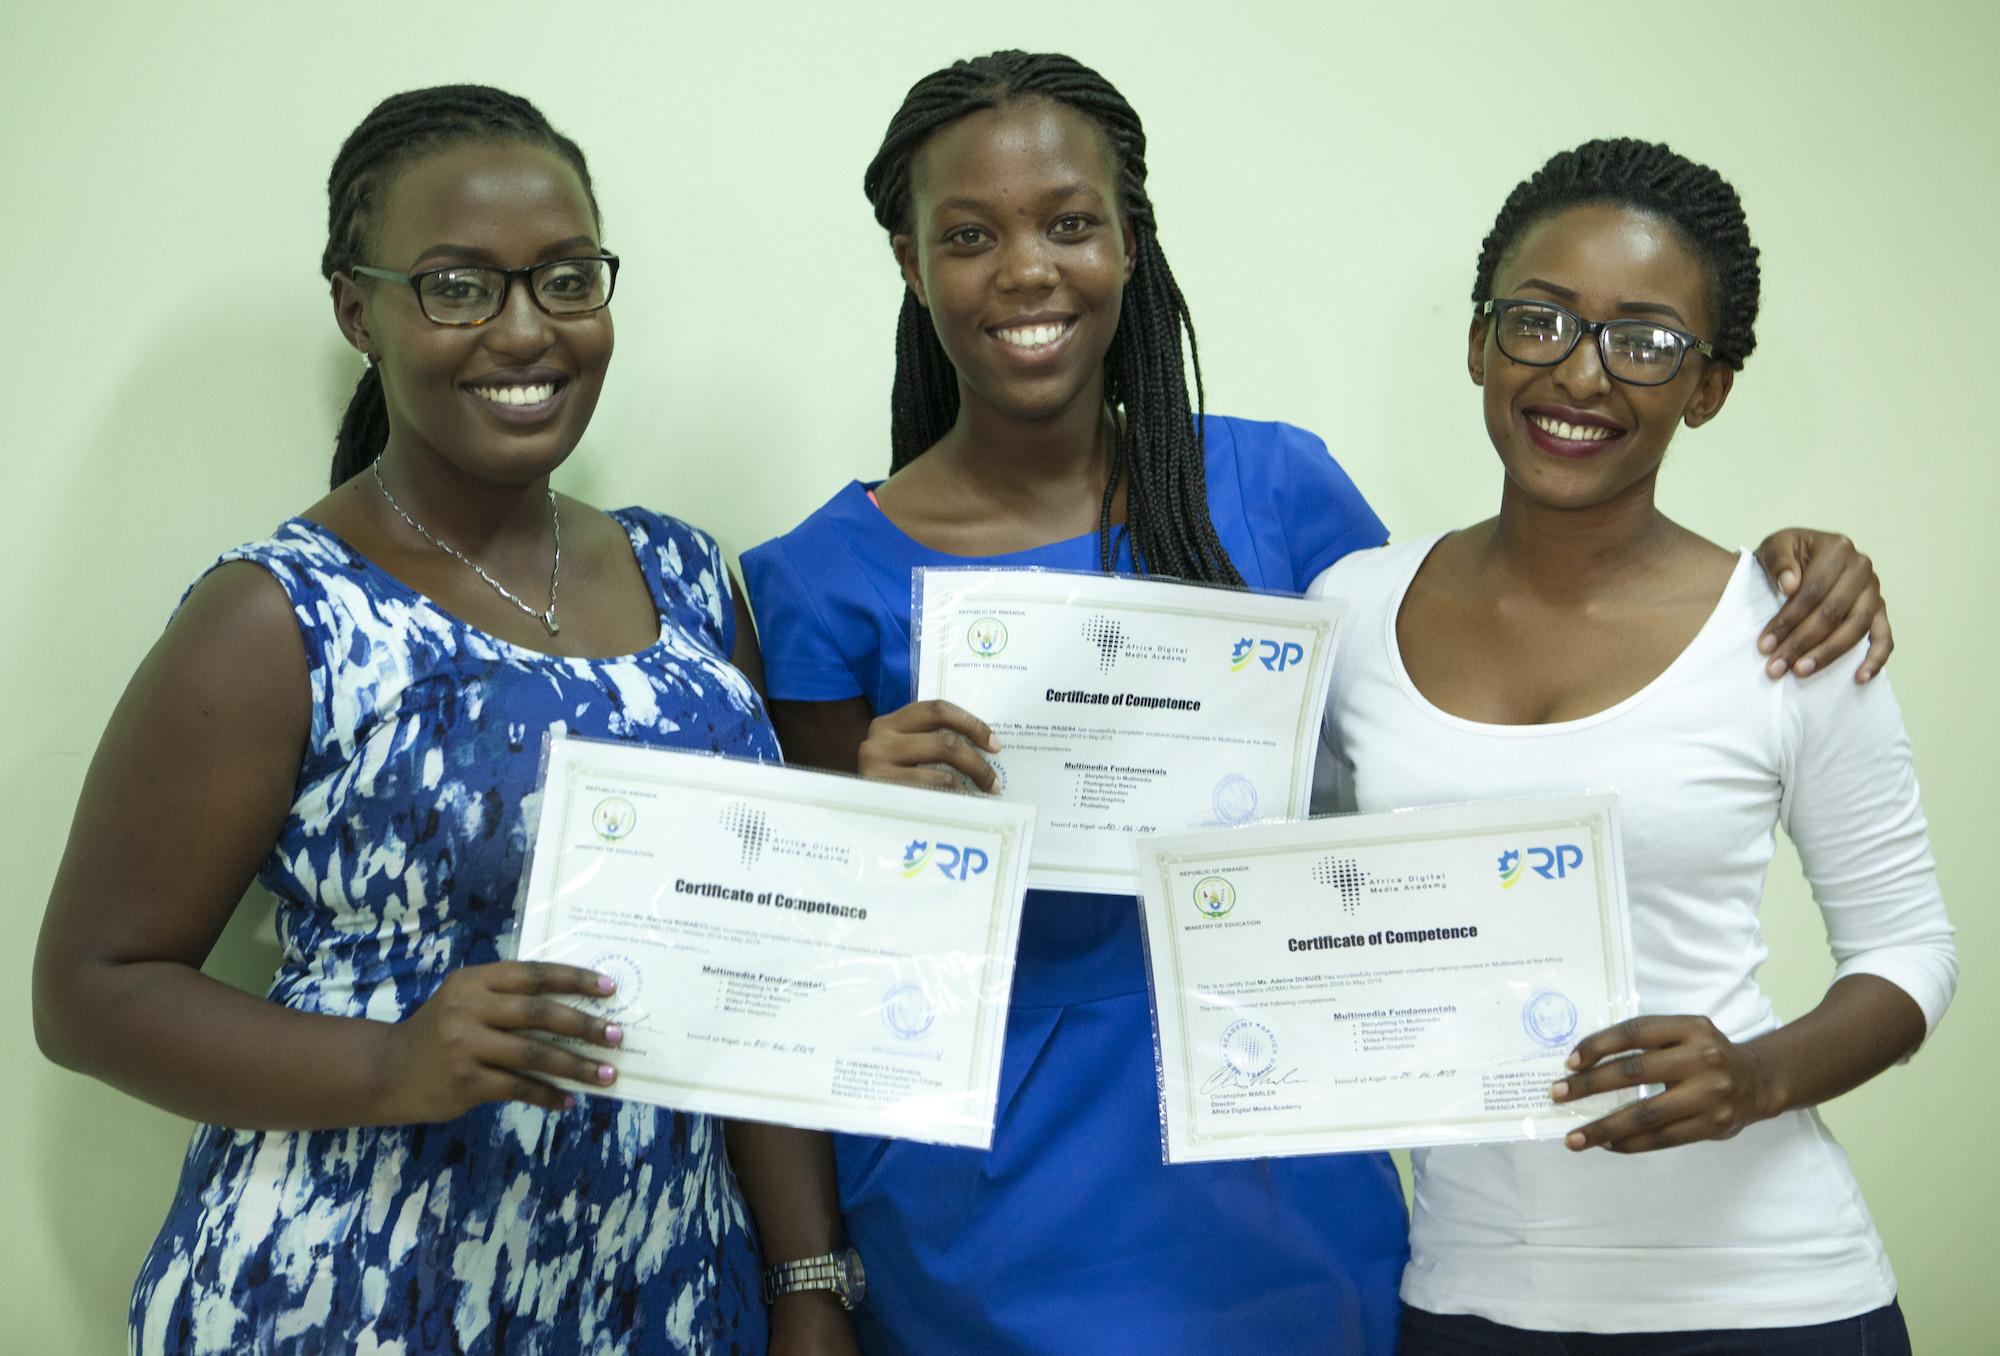 ADMA Graduates (left to right) Barbara, Sandrine, and Adeline.